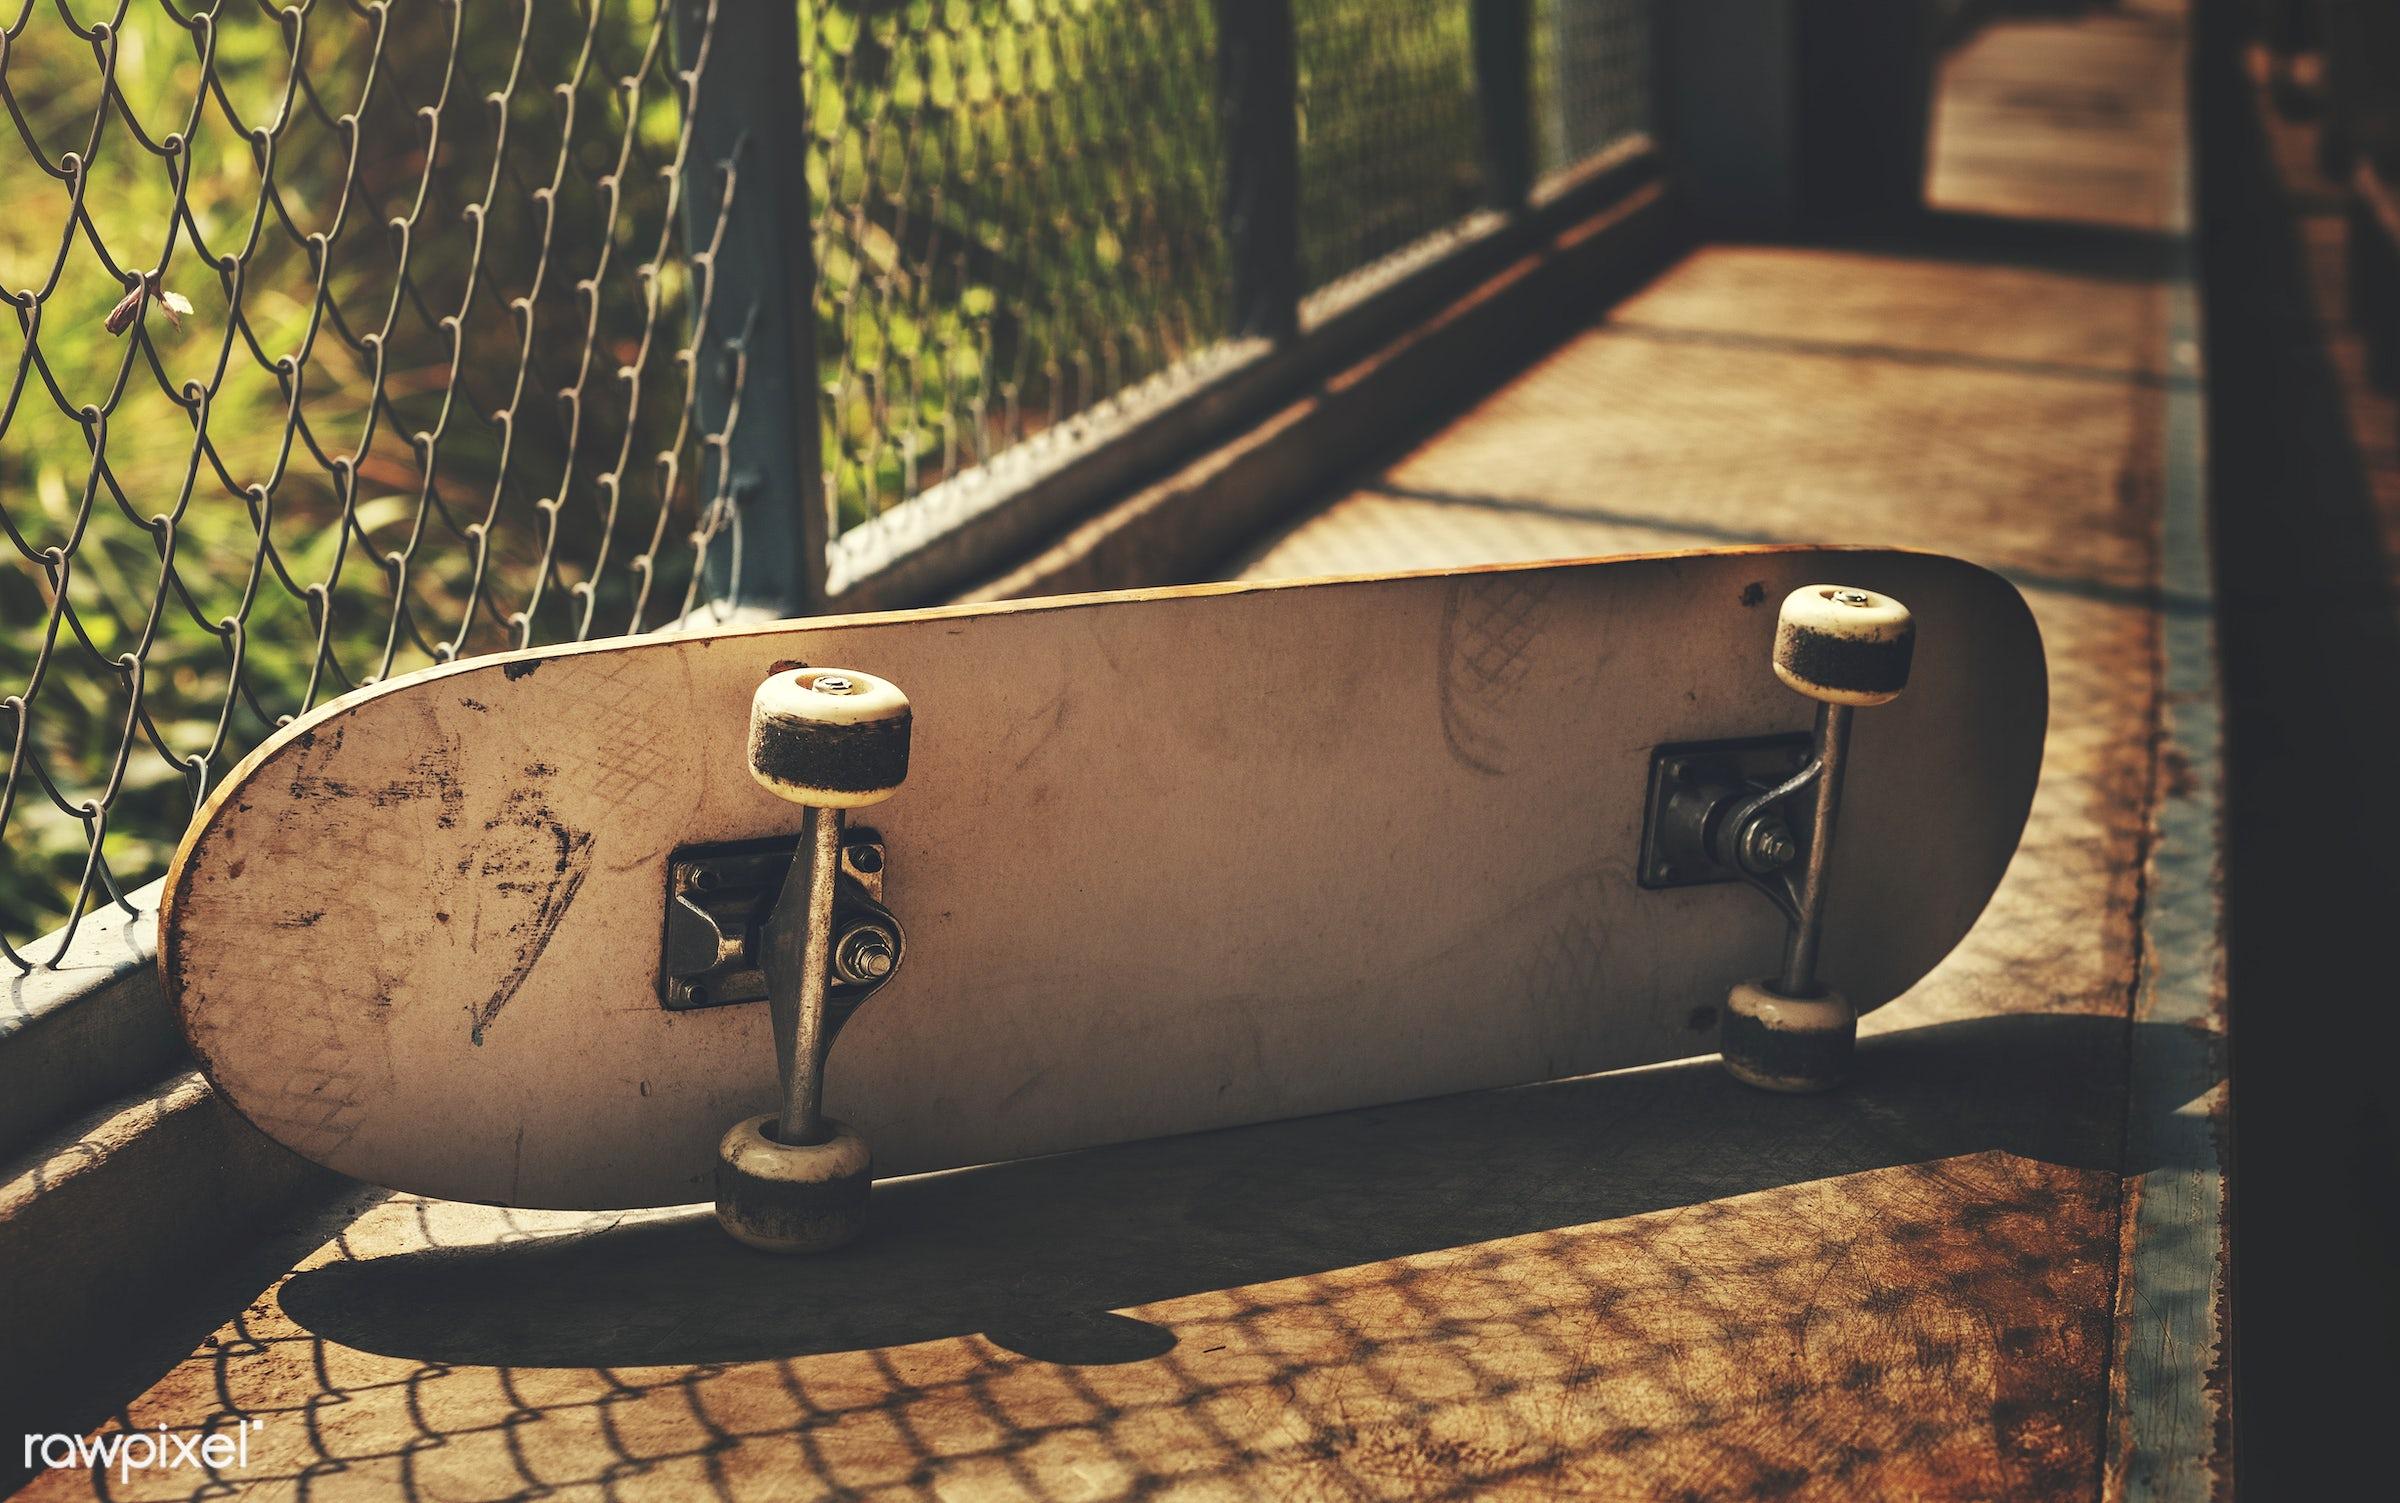 extreme sport, nobody, wheels, hobby, equipment, skateboard, skatepark, floor, side, outdoors, closeup, activity, sunbeam